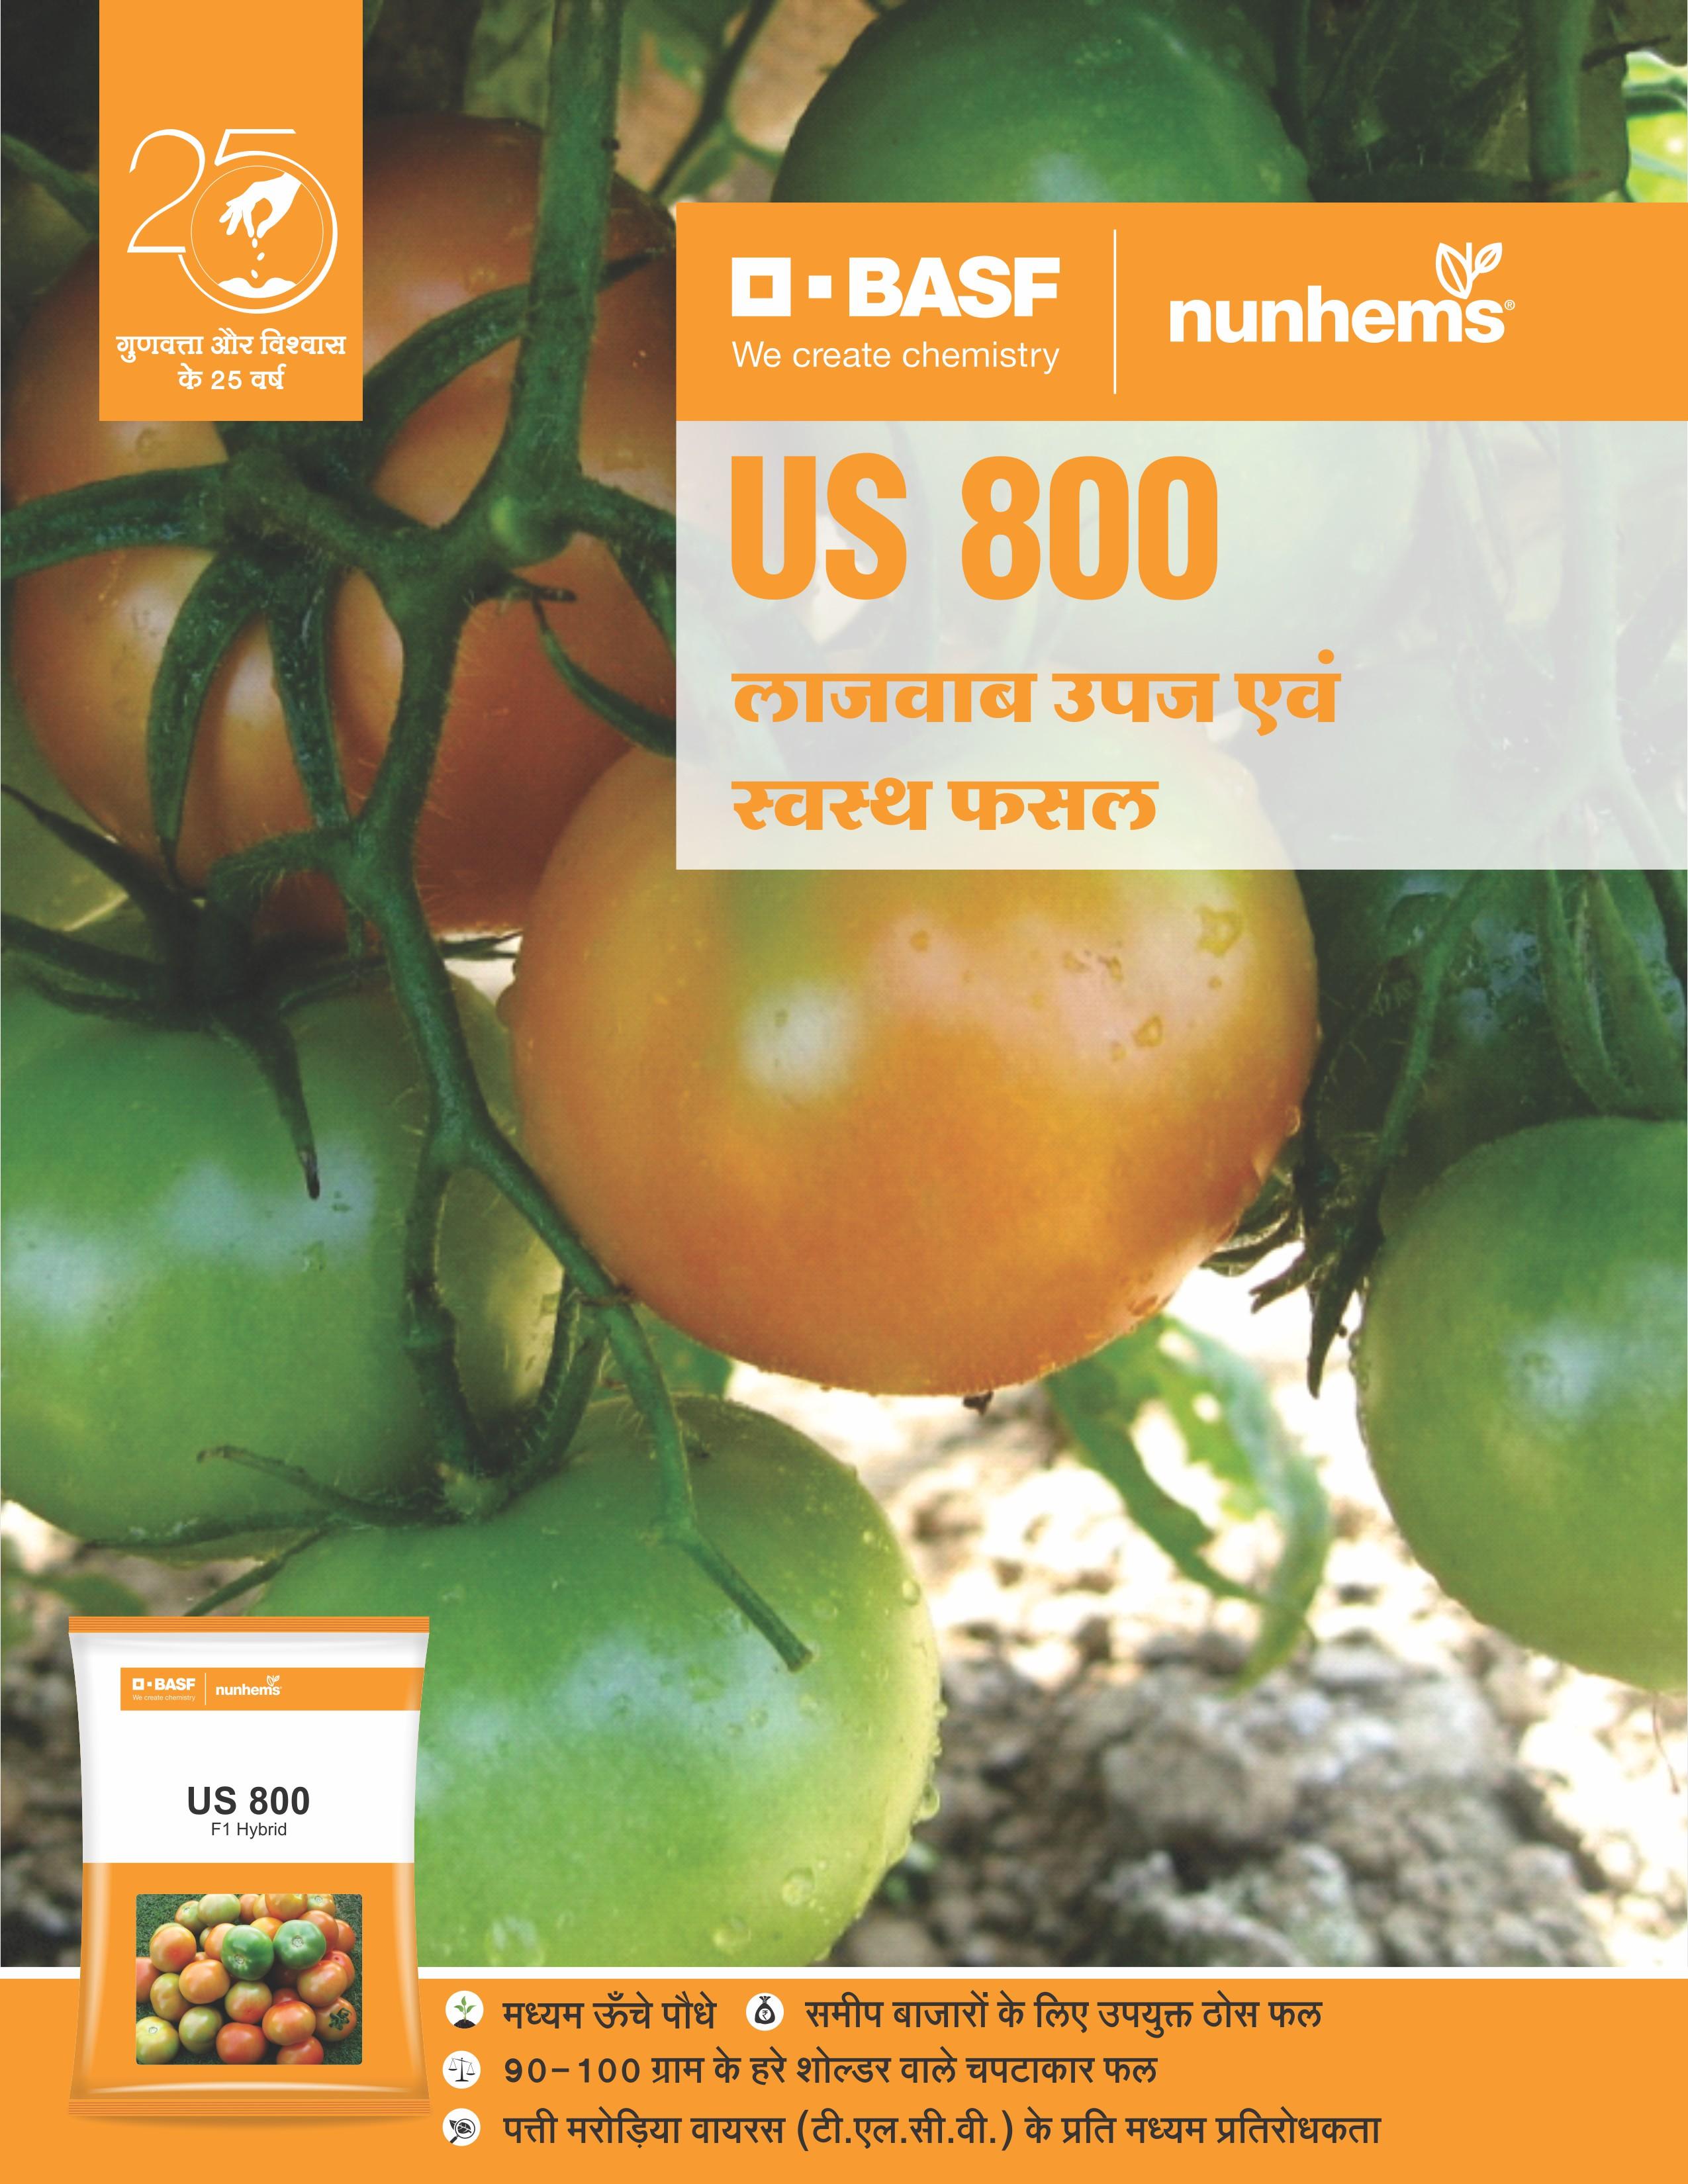 uploads/product/US_800_Poster_Hindi.jpg